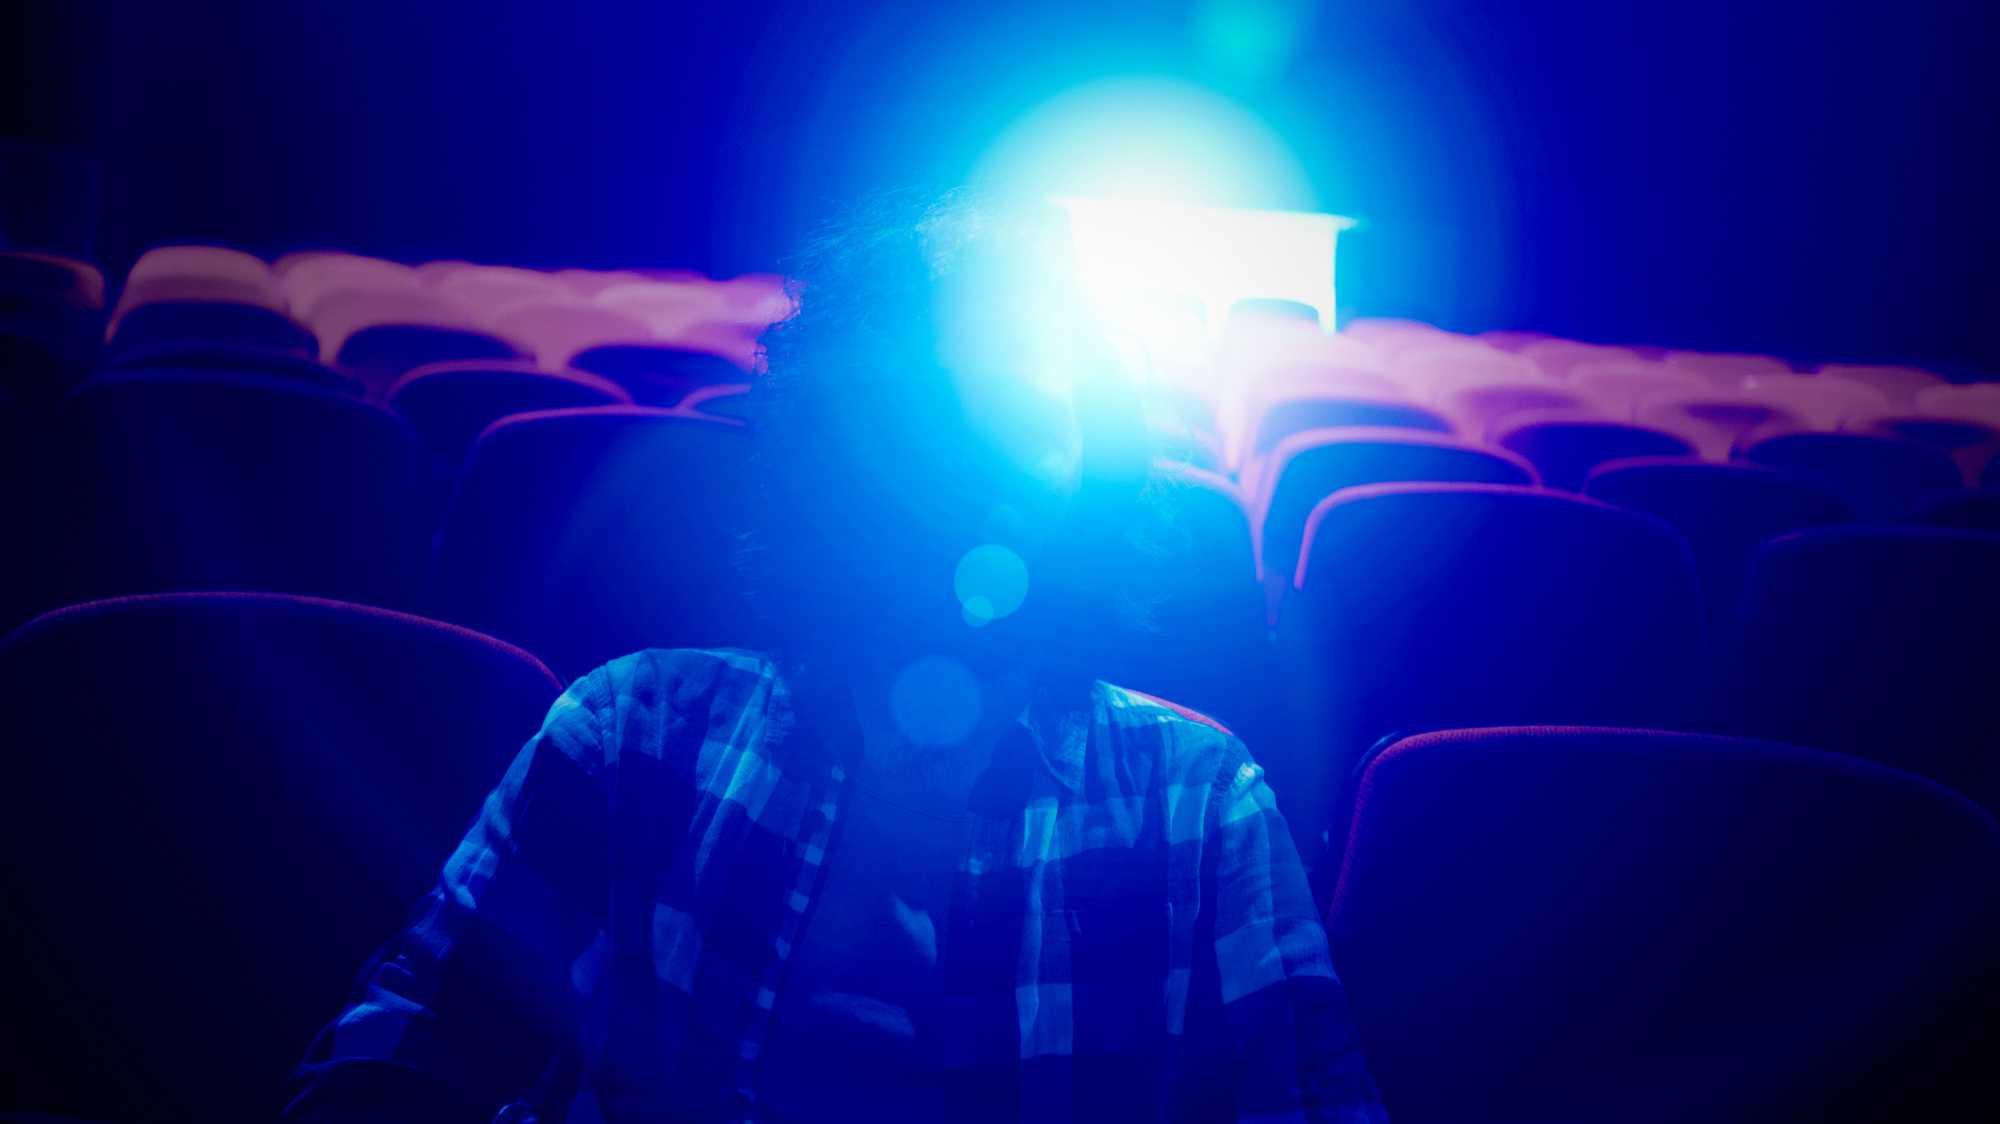 Jugendschutz im Kinosaal – freiwillige Selbstkontrolle feiert 70sten